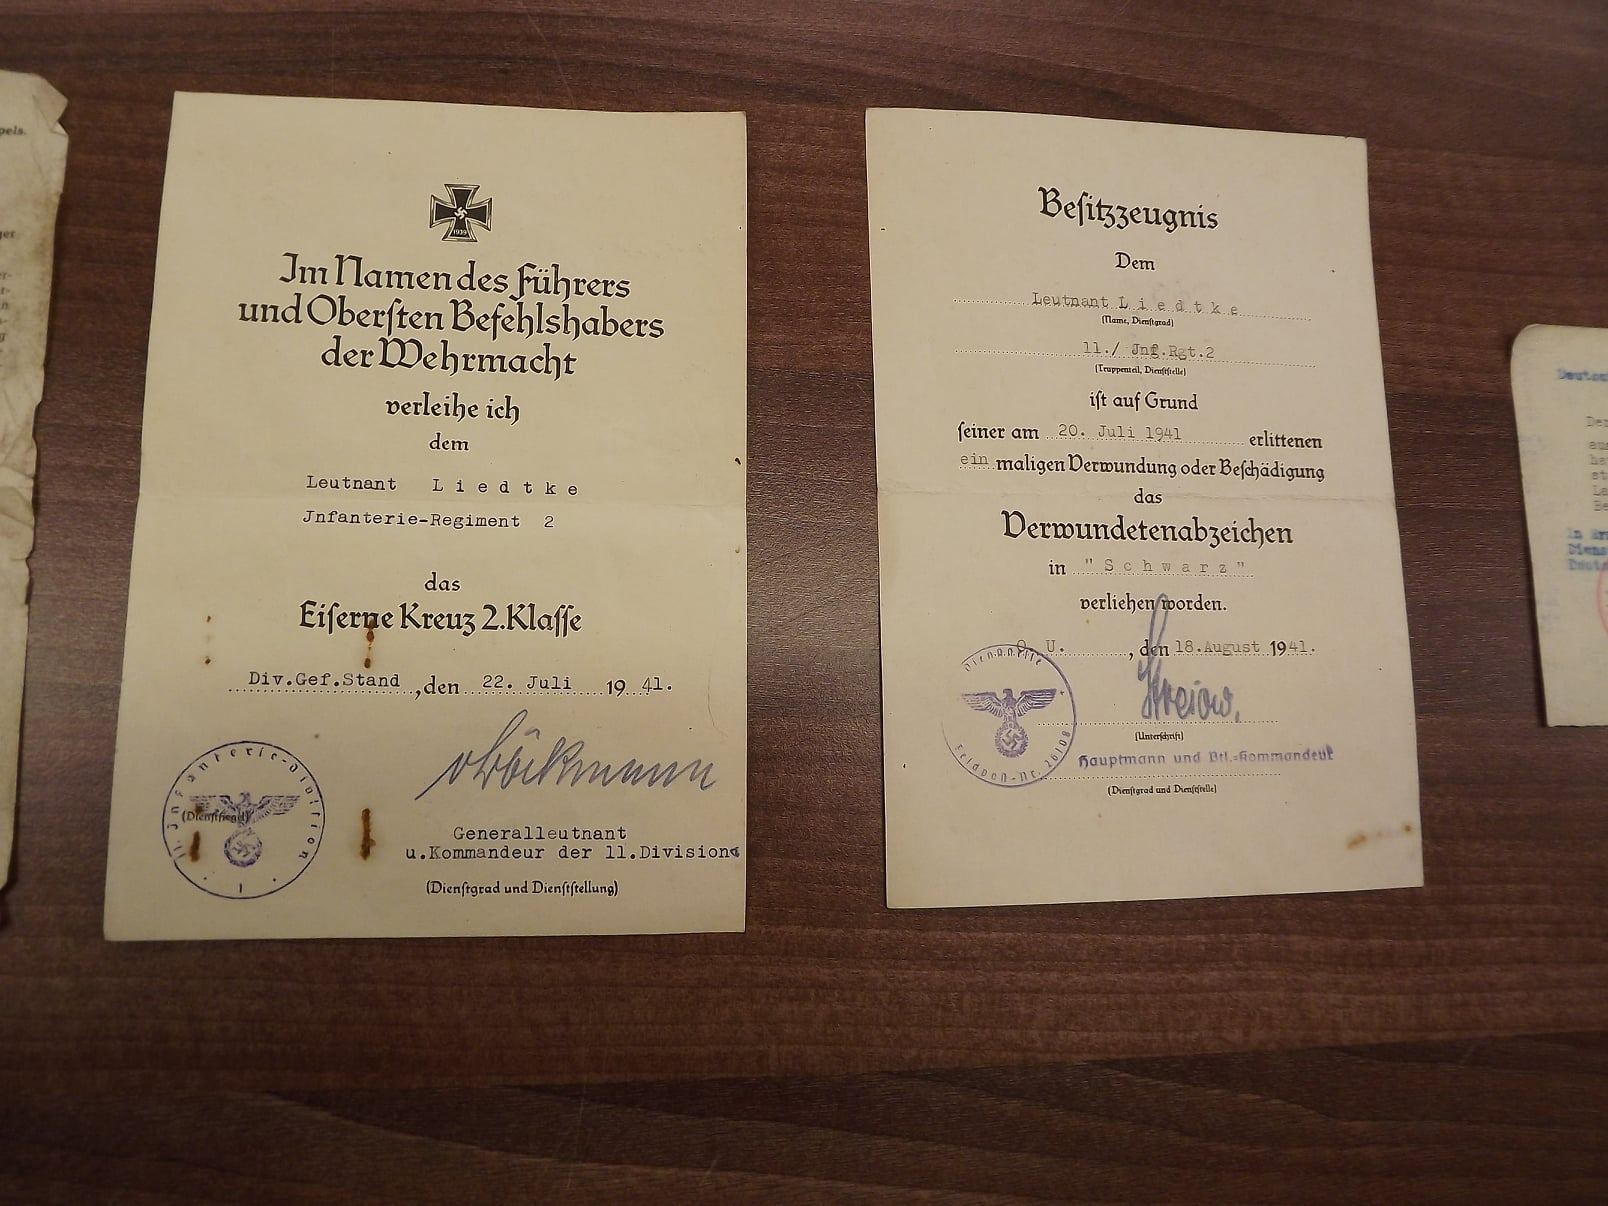 Gerhard Liedtke dokuments